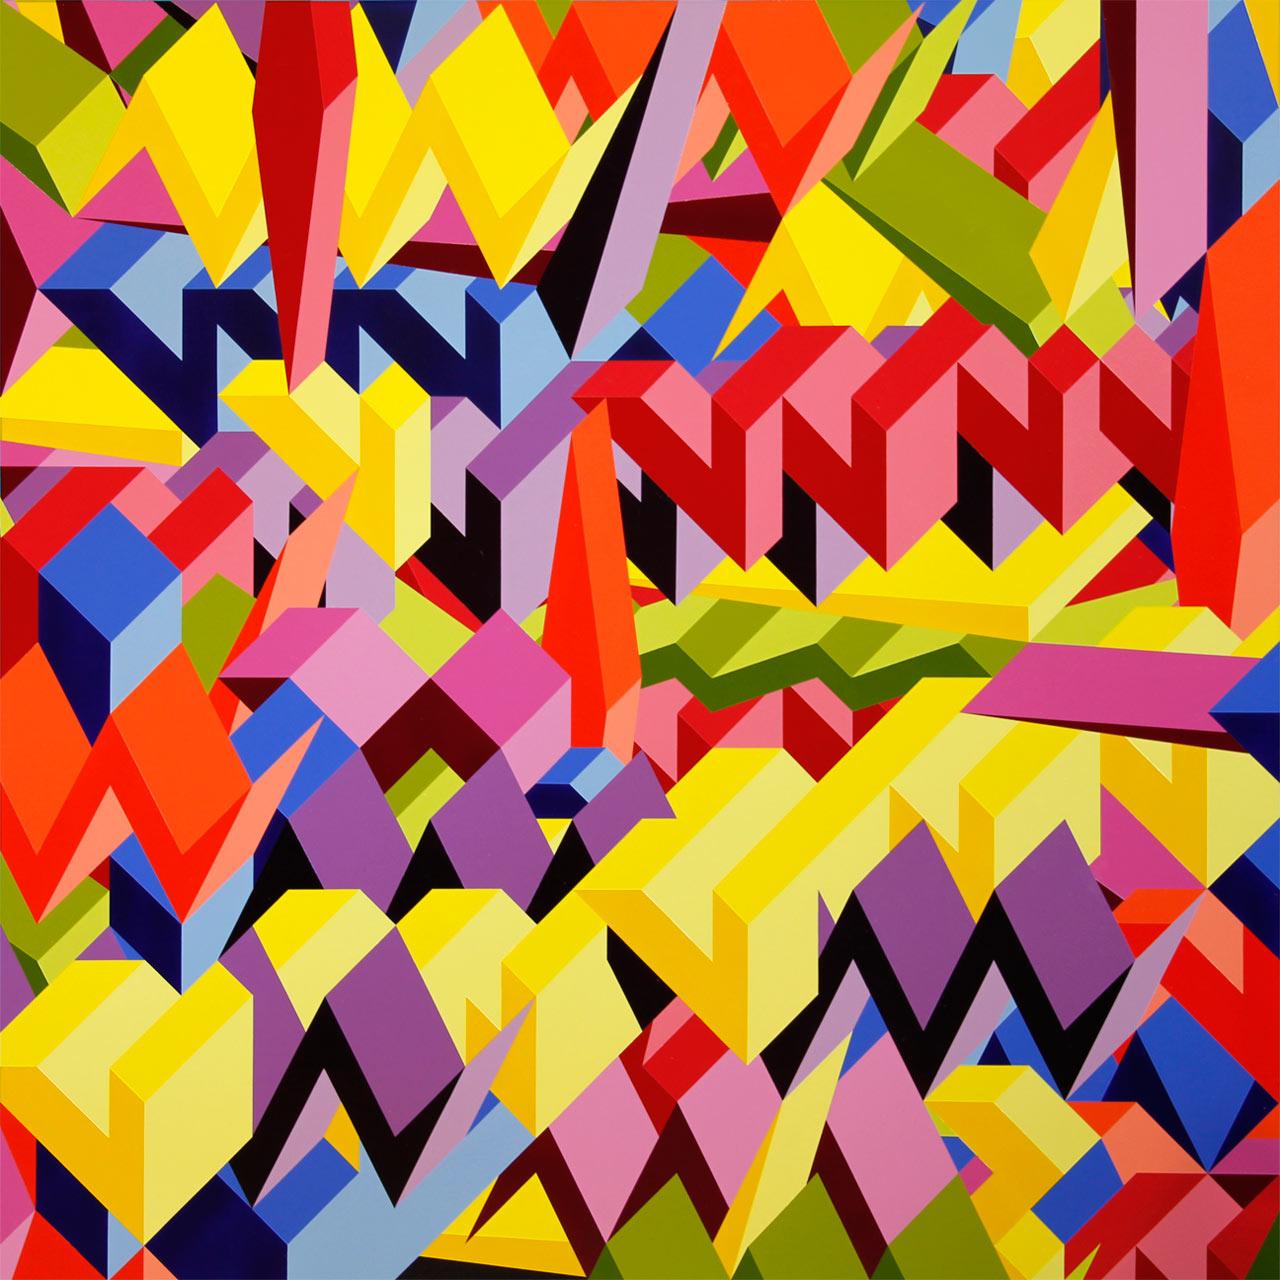 adam-daily-urban-street-painting-M6-2013-48X48